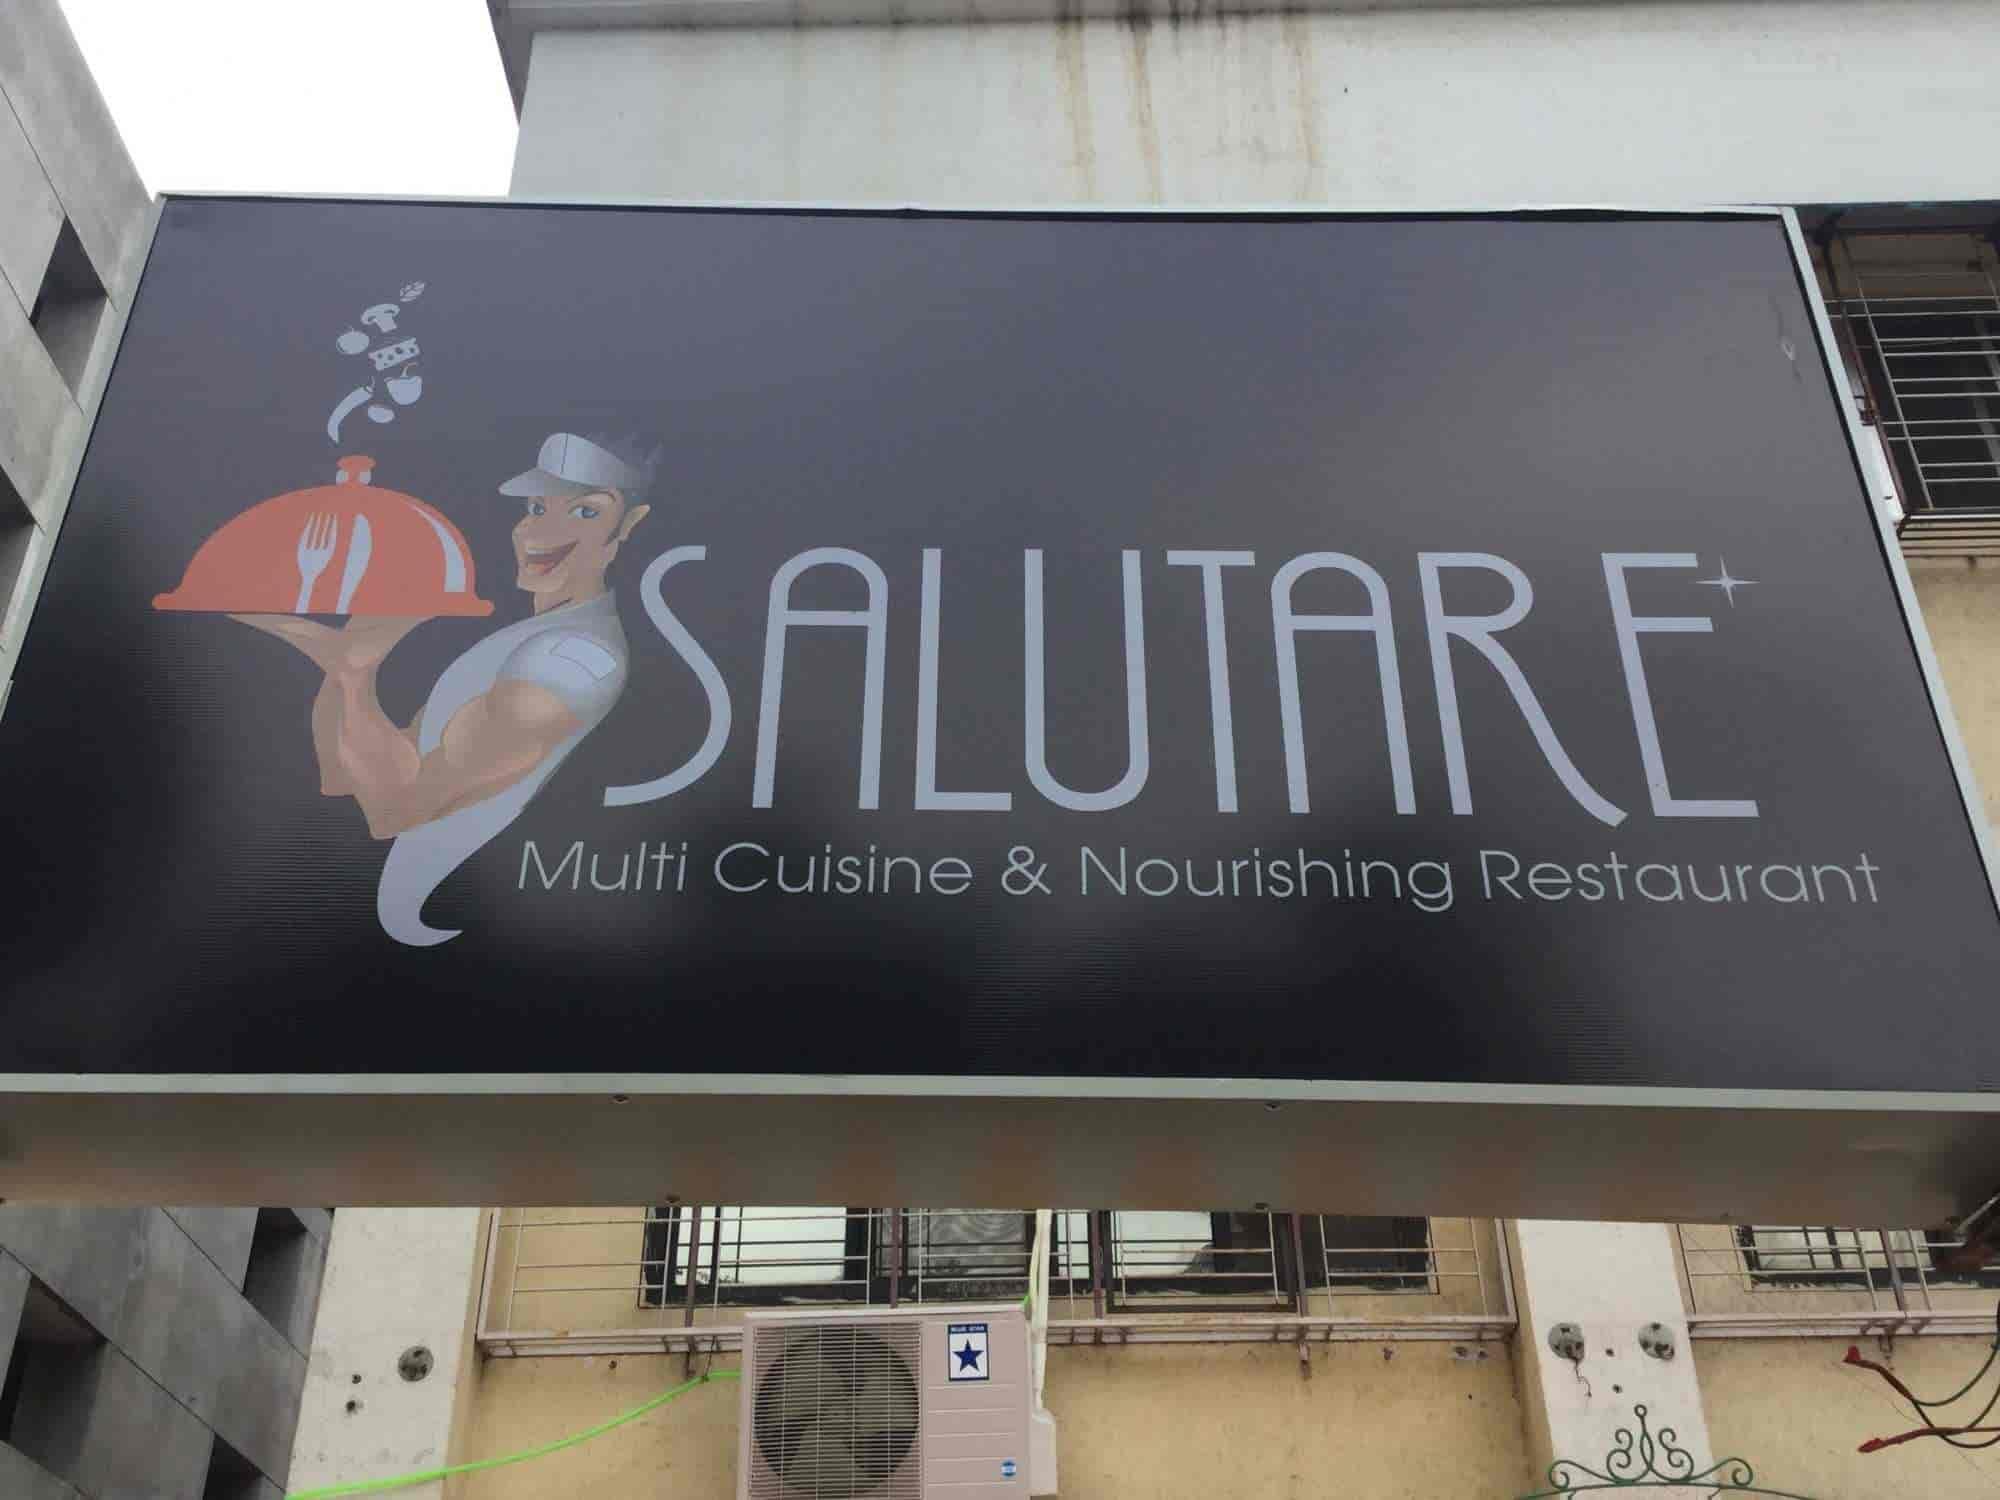 Salutare Multi Cuisine Nourishing Restaurant Photos, Model Colony ...